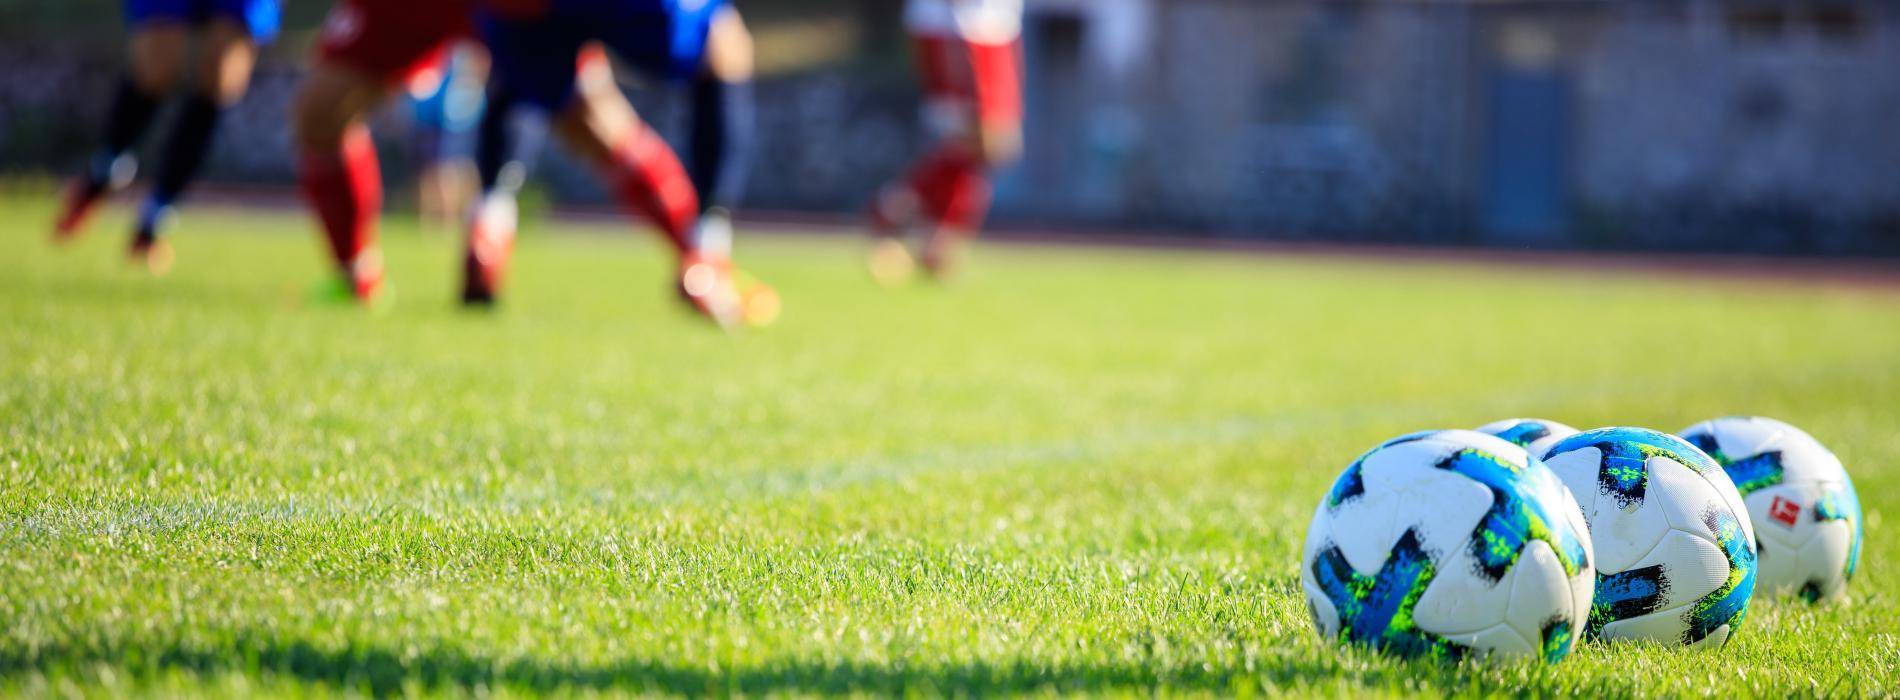 Fußball-Trainingslager